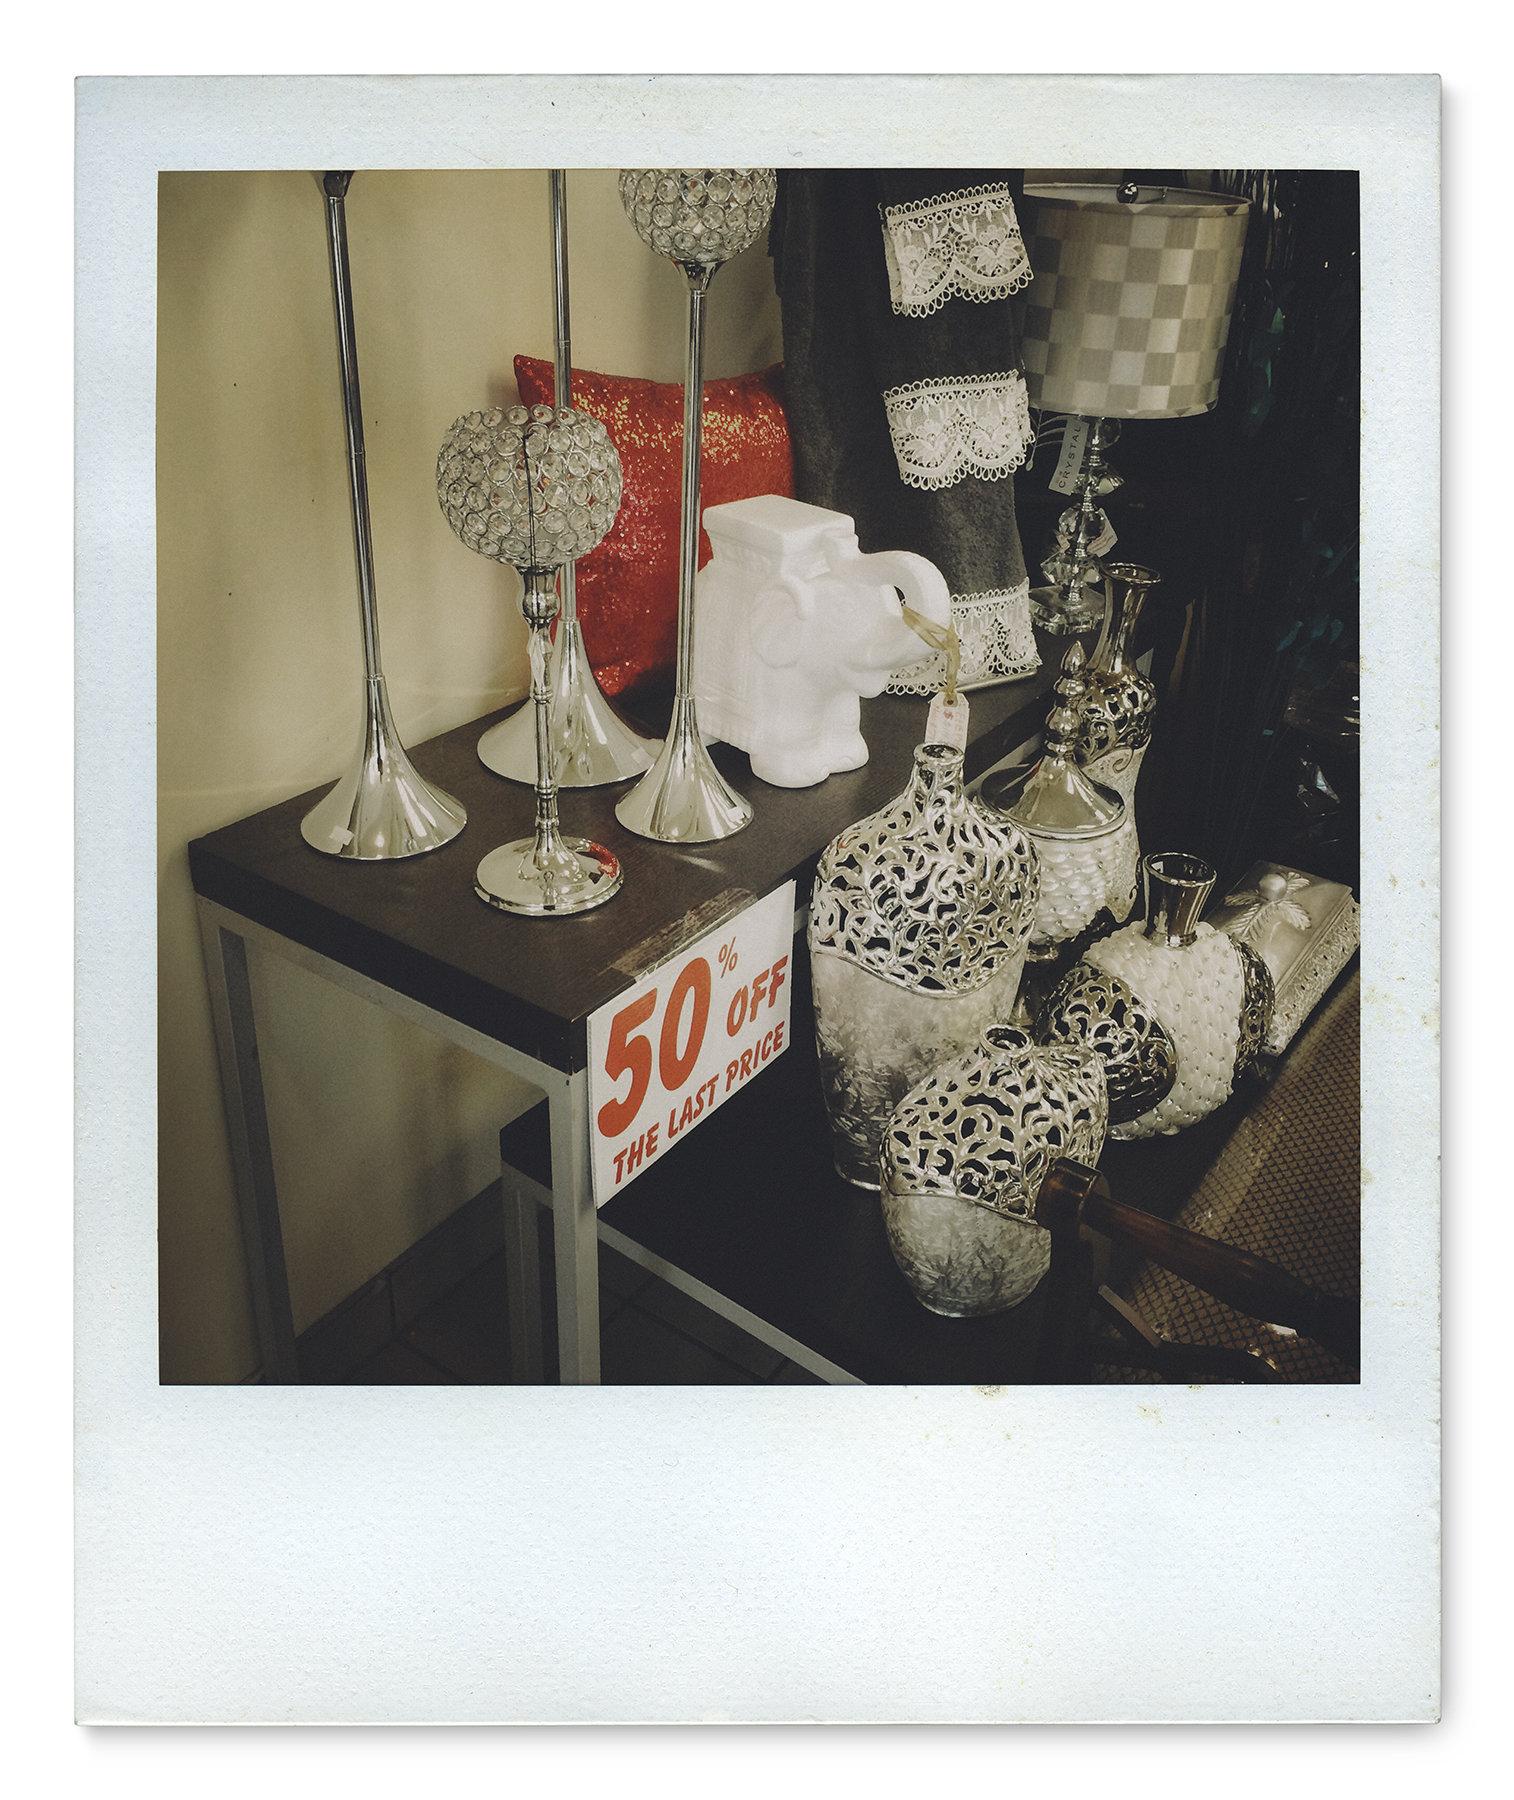 064_Polaroid SX70_IMG_0612.jpg